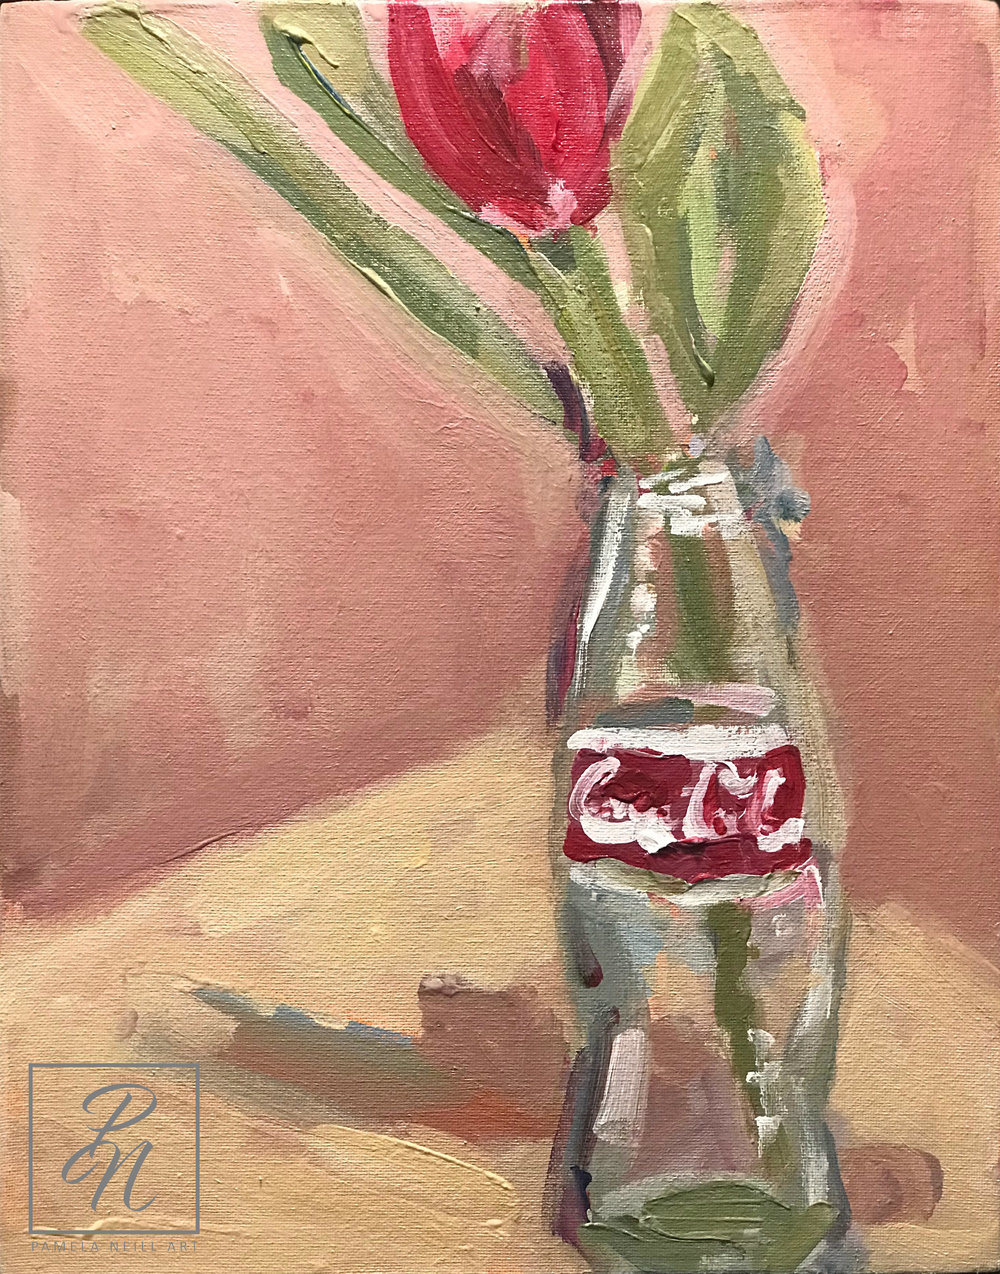 Tulip and a Coke